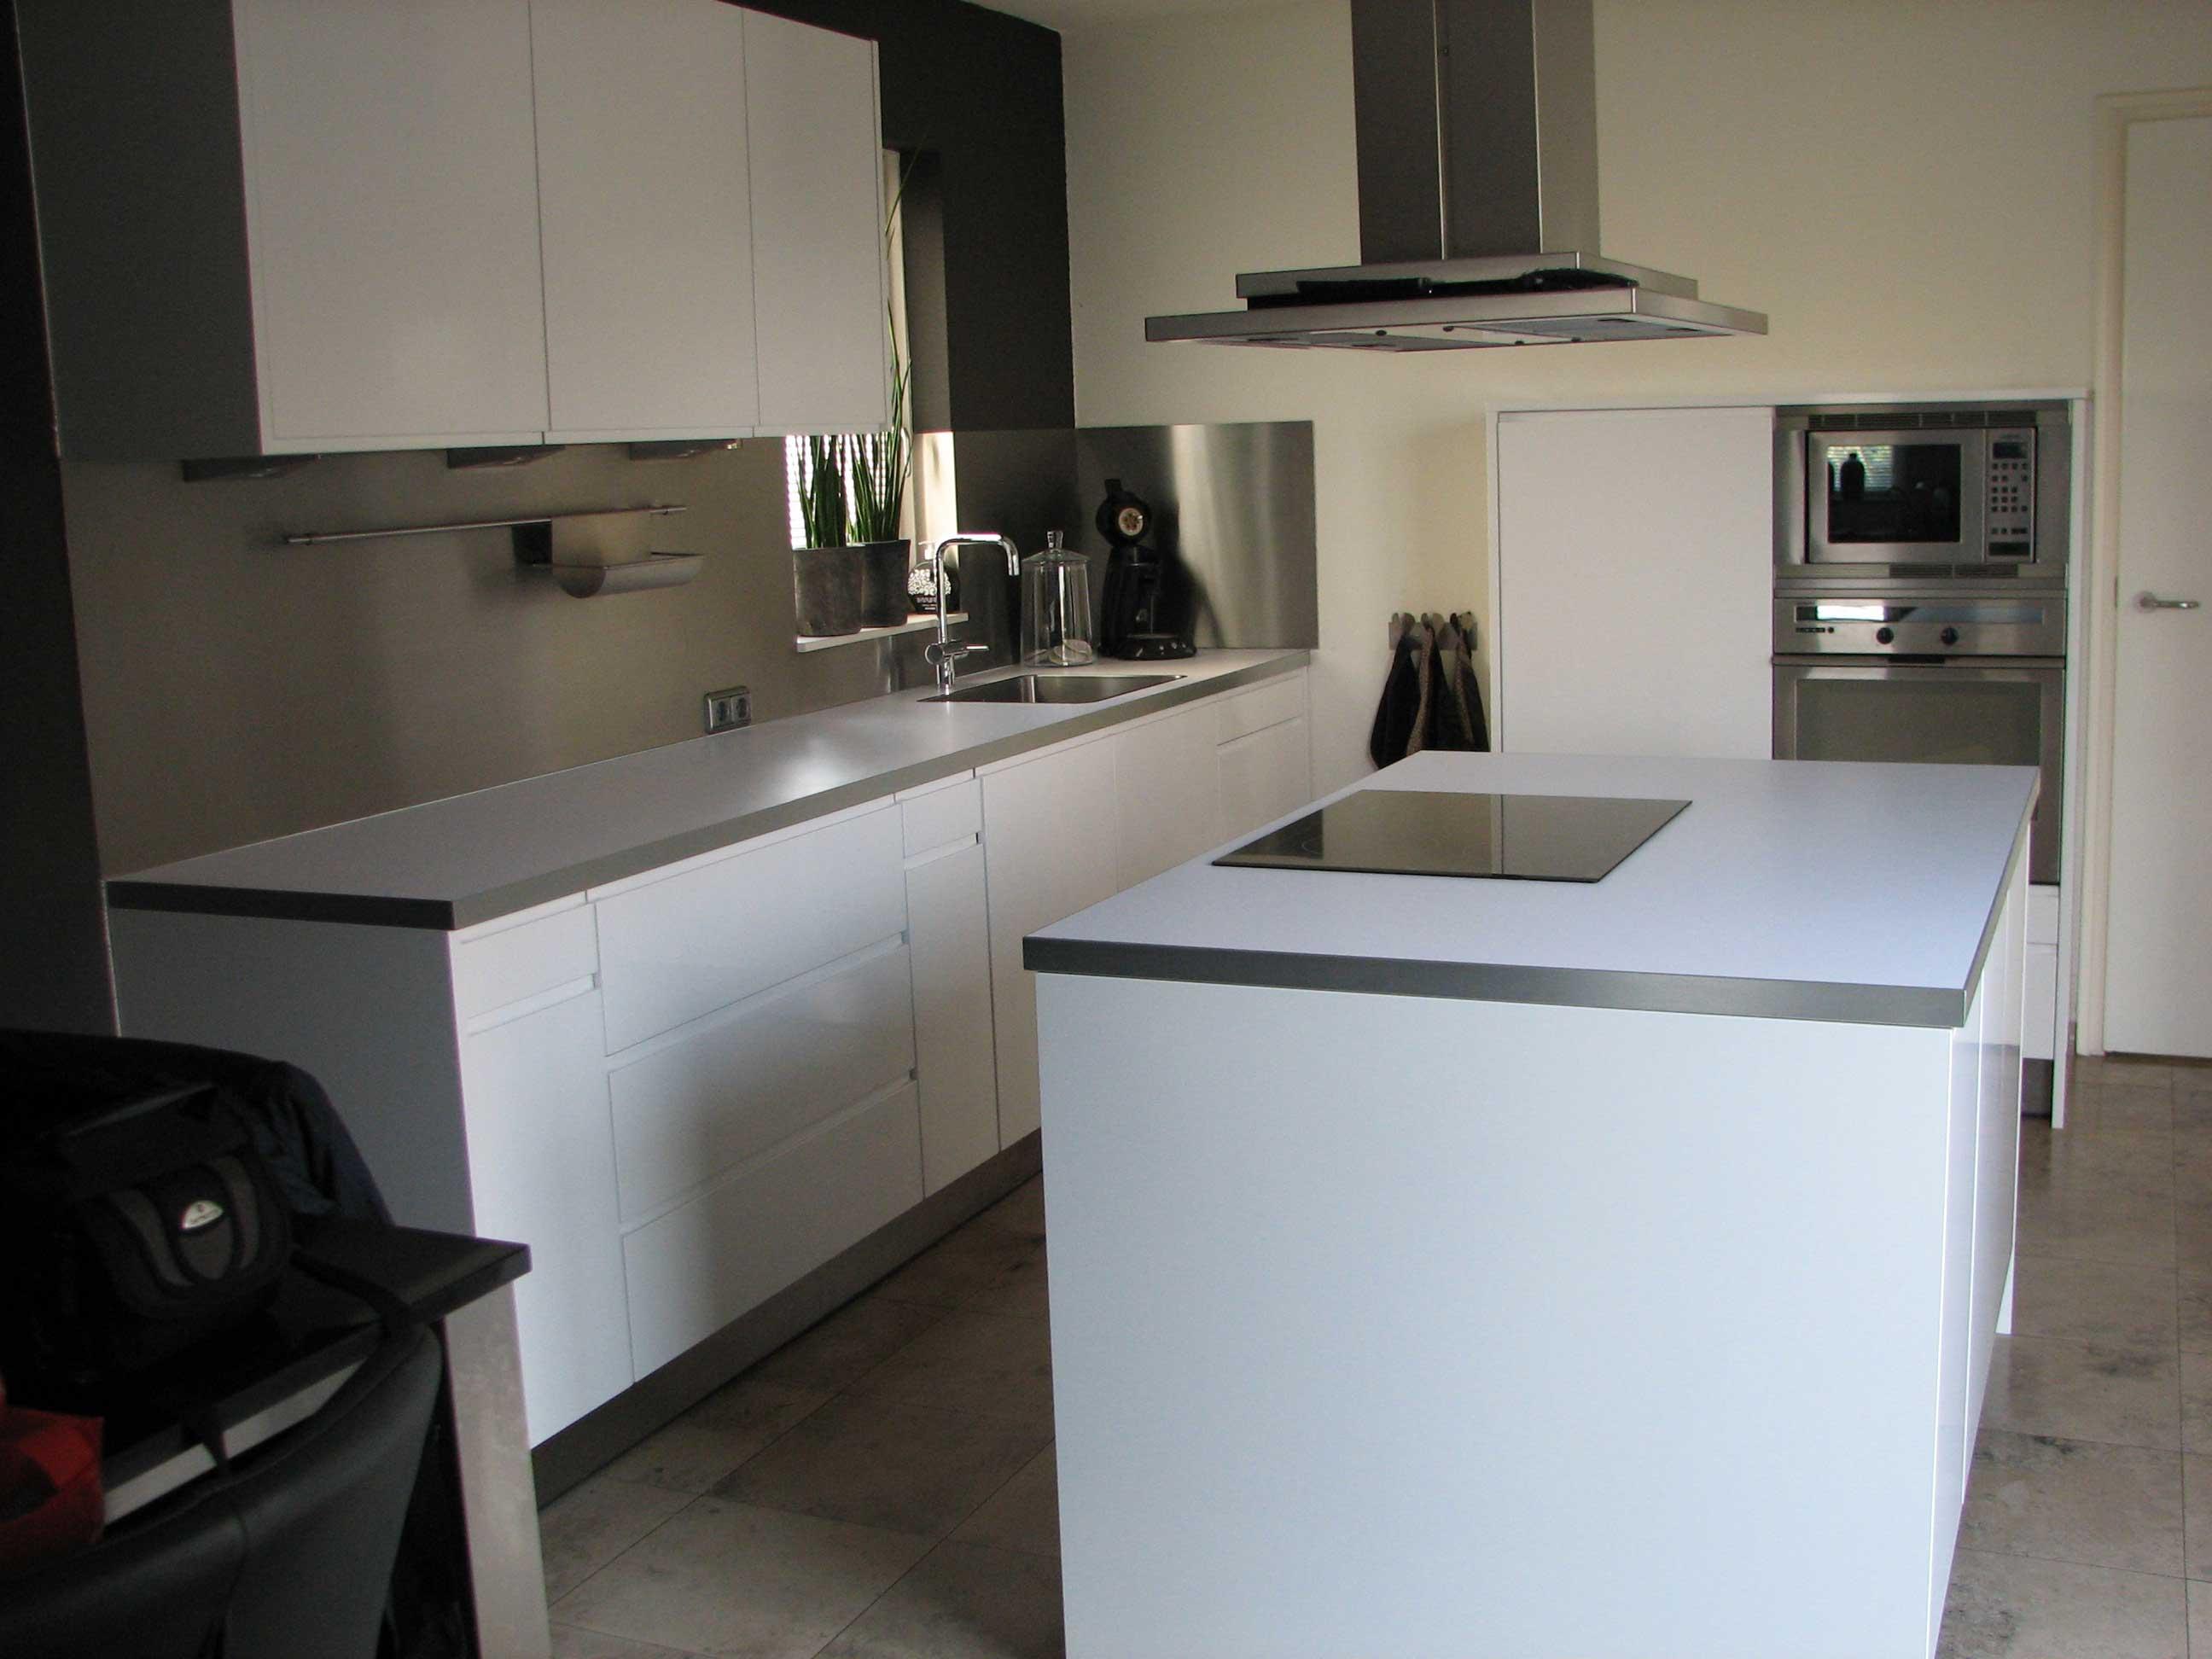 Keukenrenovatie Apparatuur : Renovatie